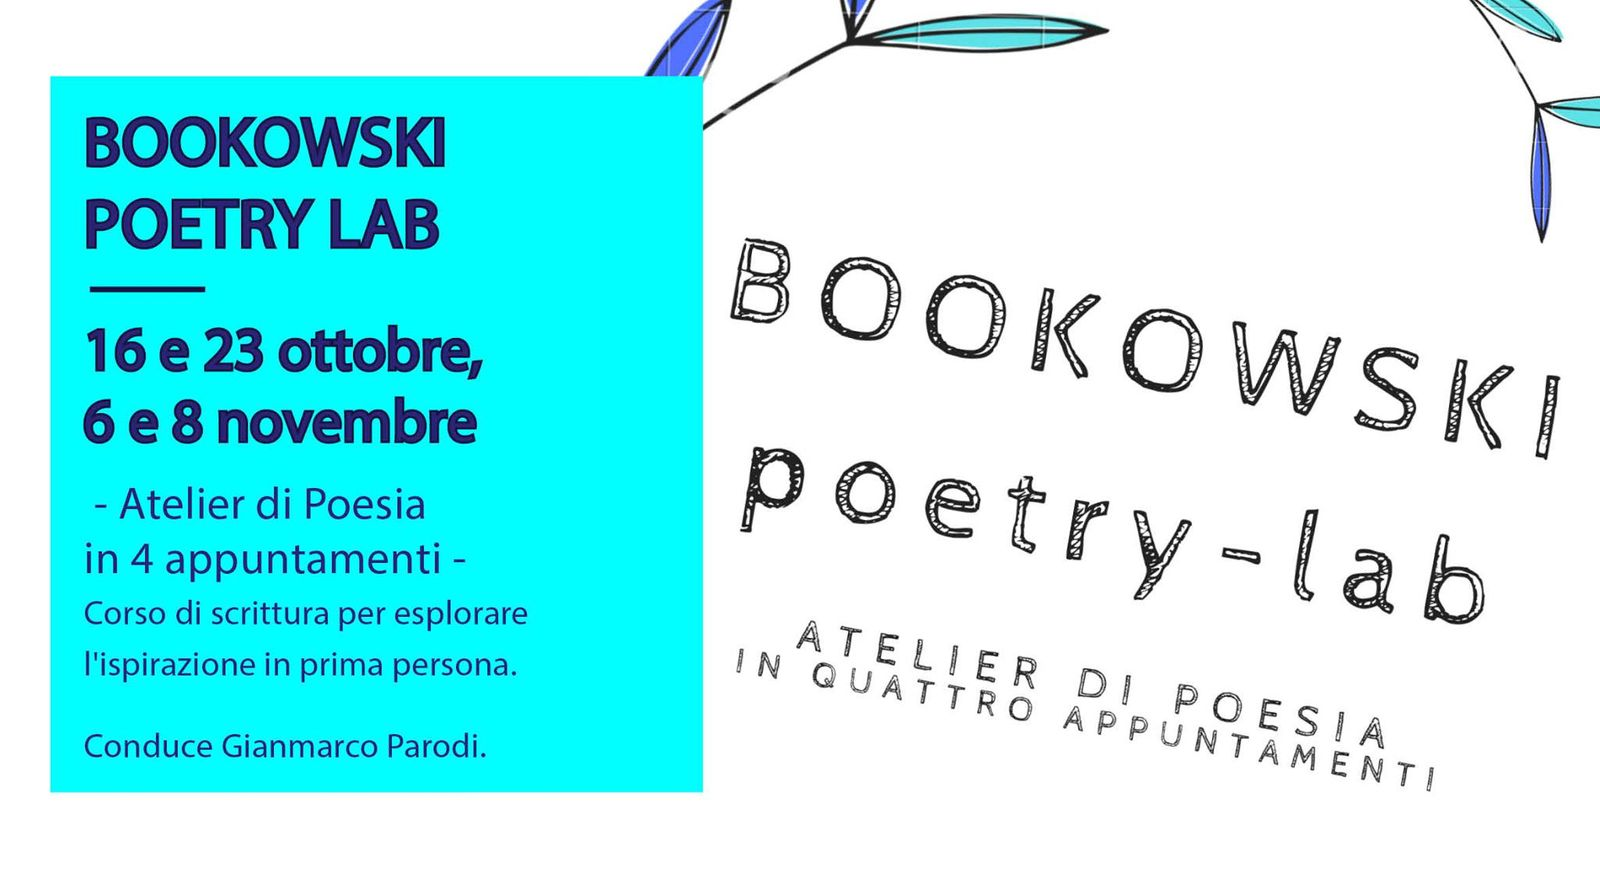 Bookowski Poetry Lab